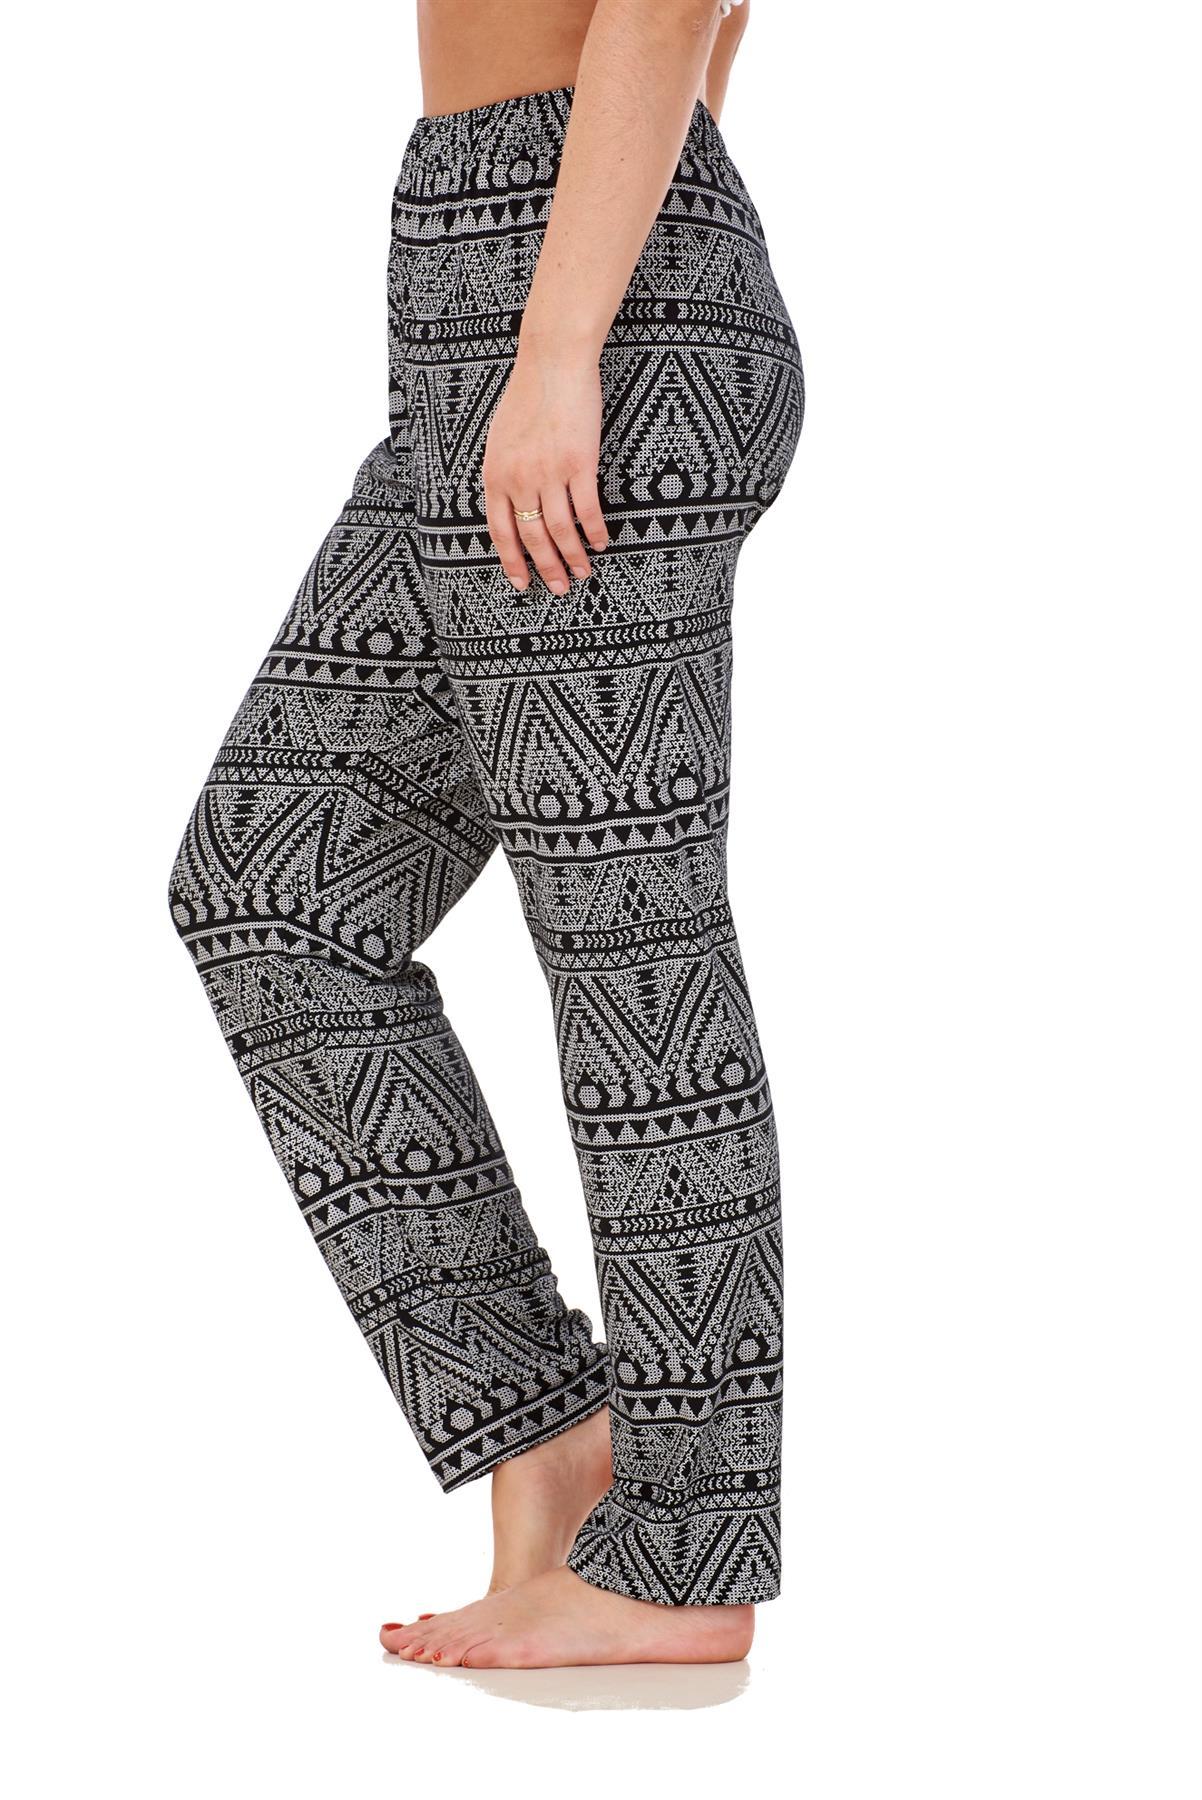 Ladies-Women-Trouser-Elasticated-Printed-Tapered-Harem-High-waist-Regular-Pants thumbnail 11